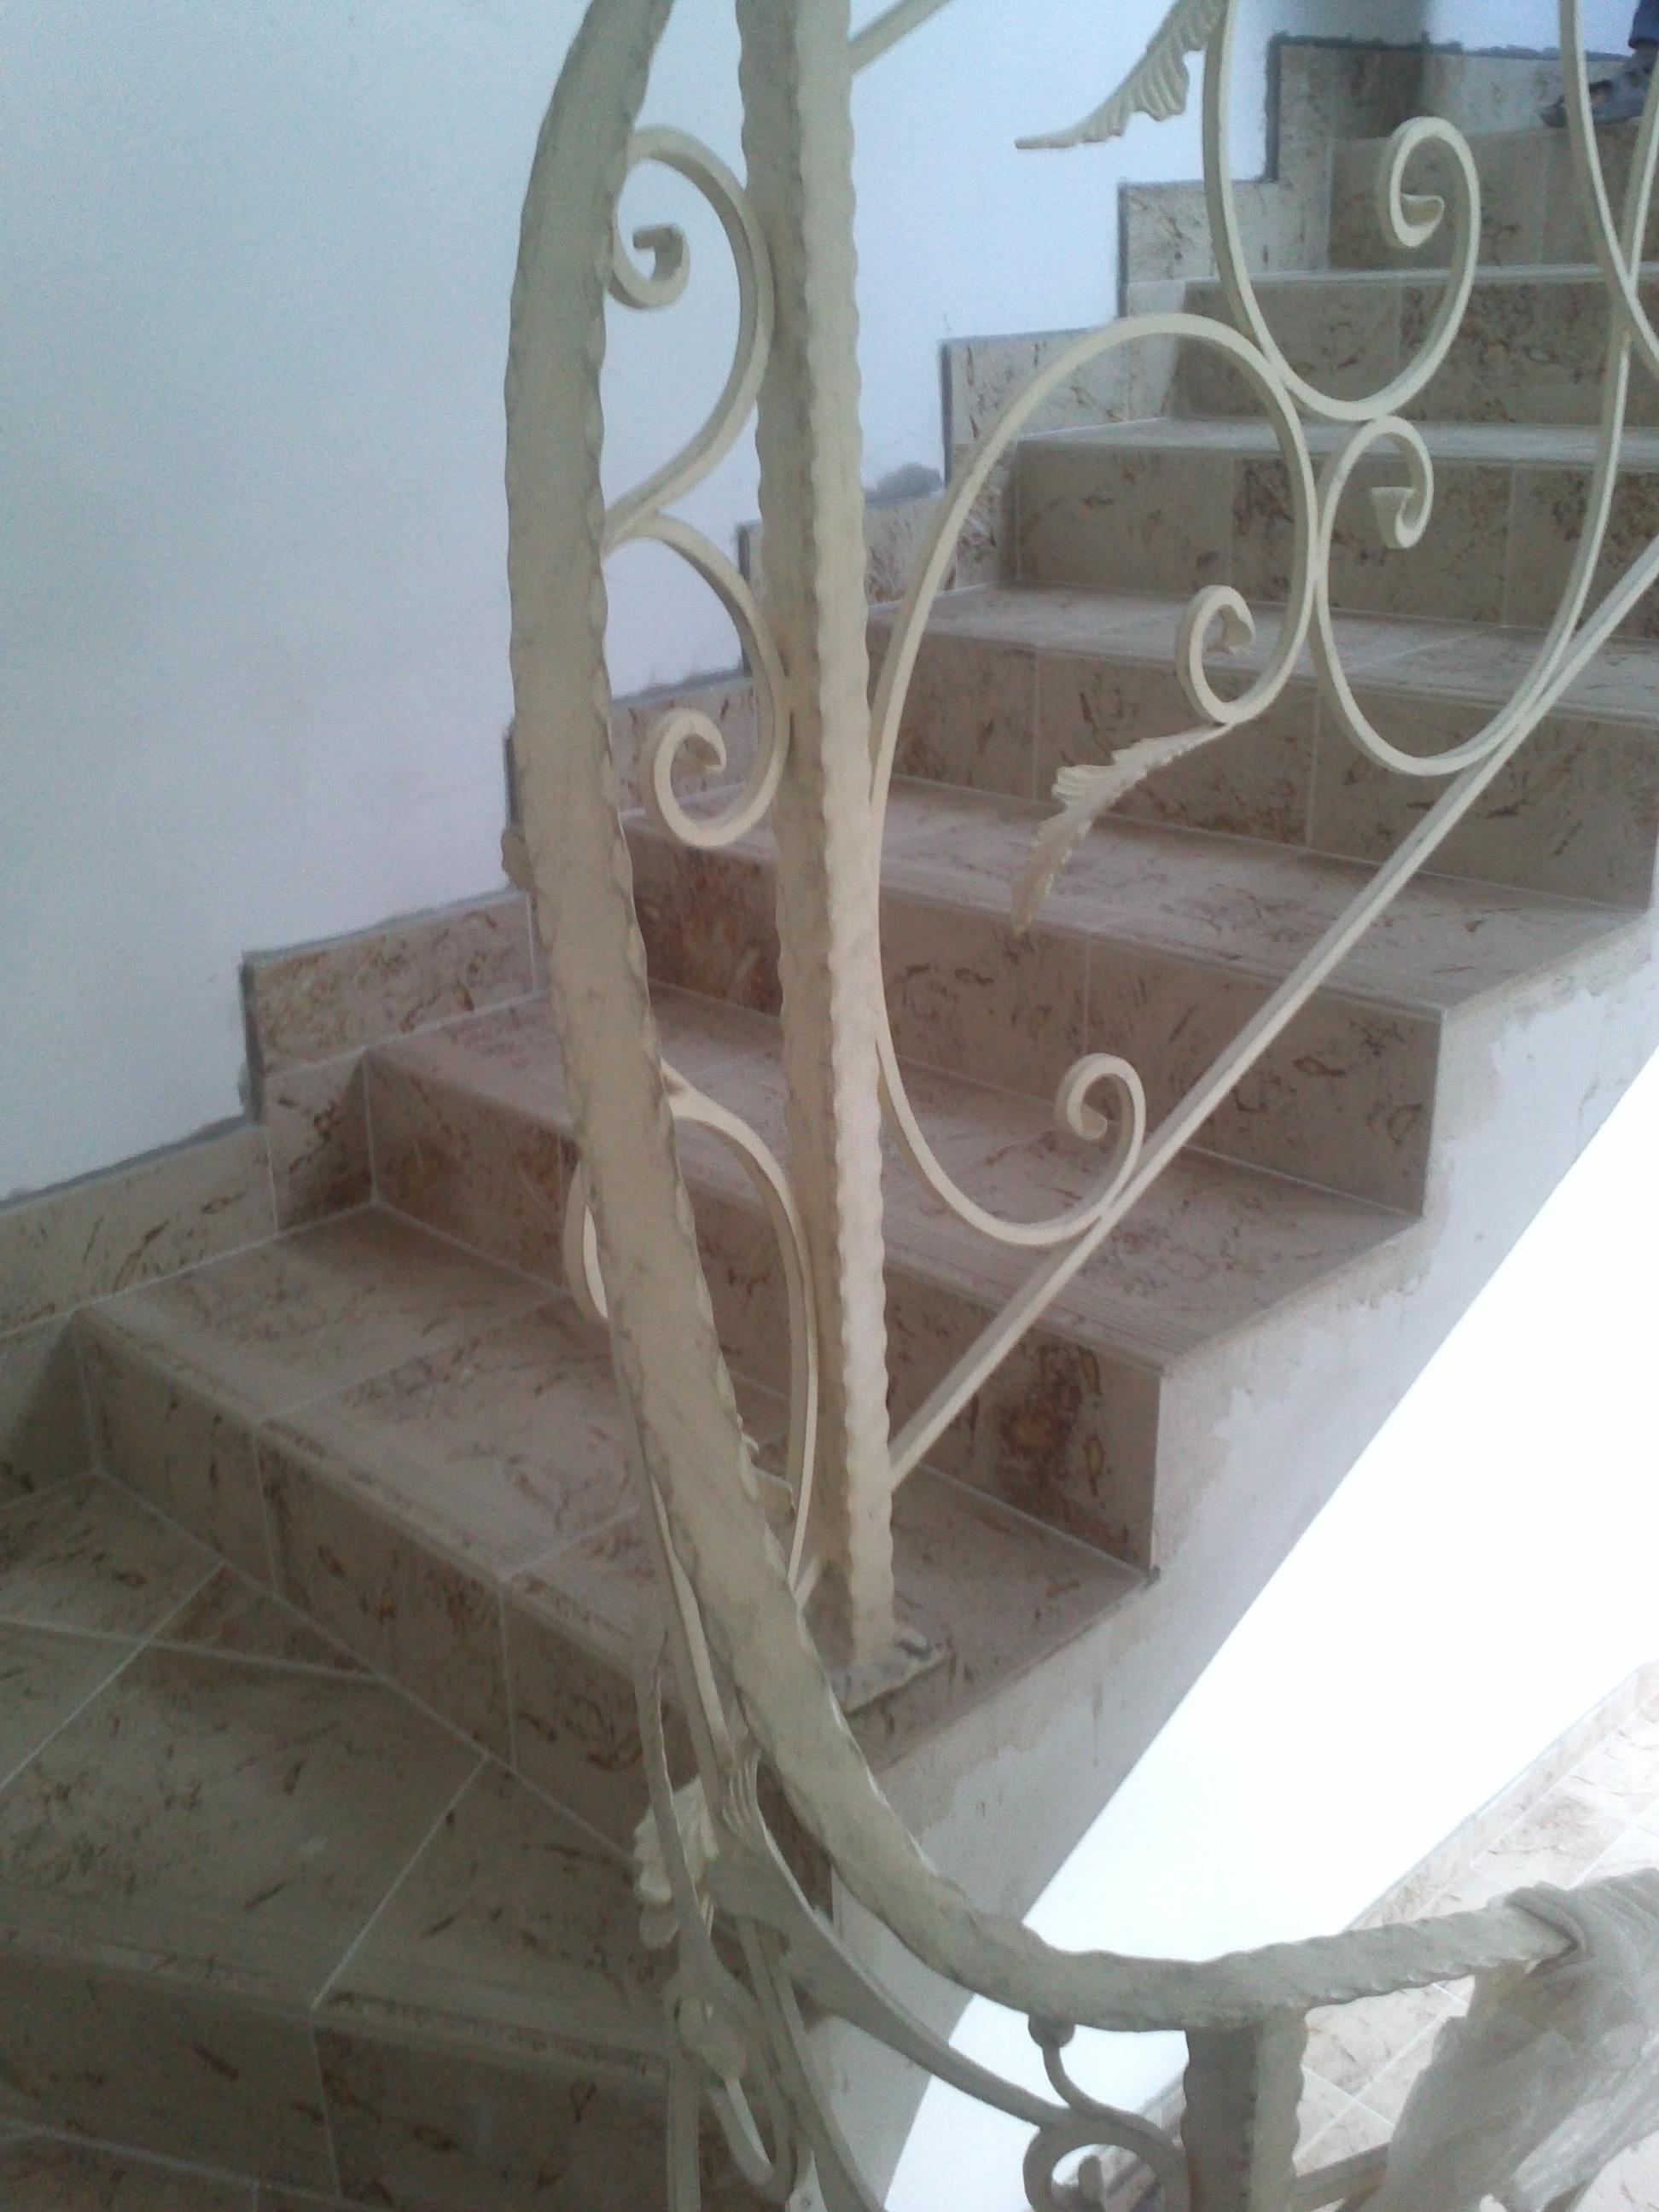 Поворотный элемент на лестнице